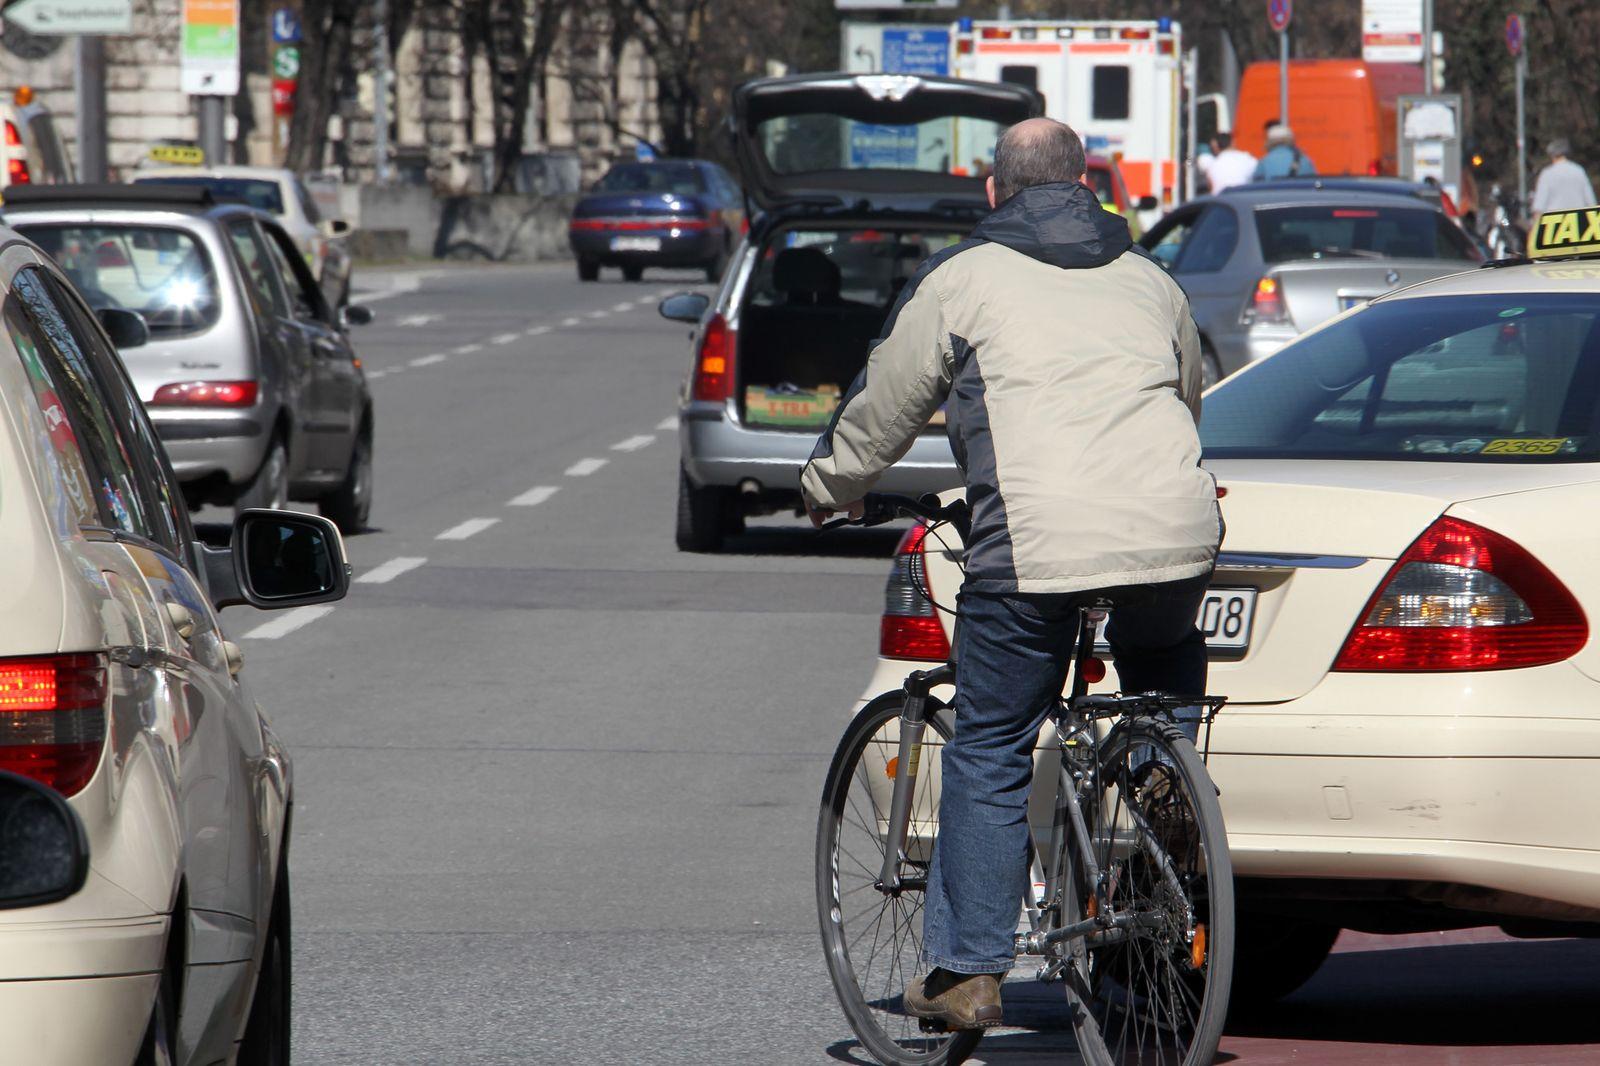 Fahrrad / Auto